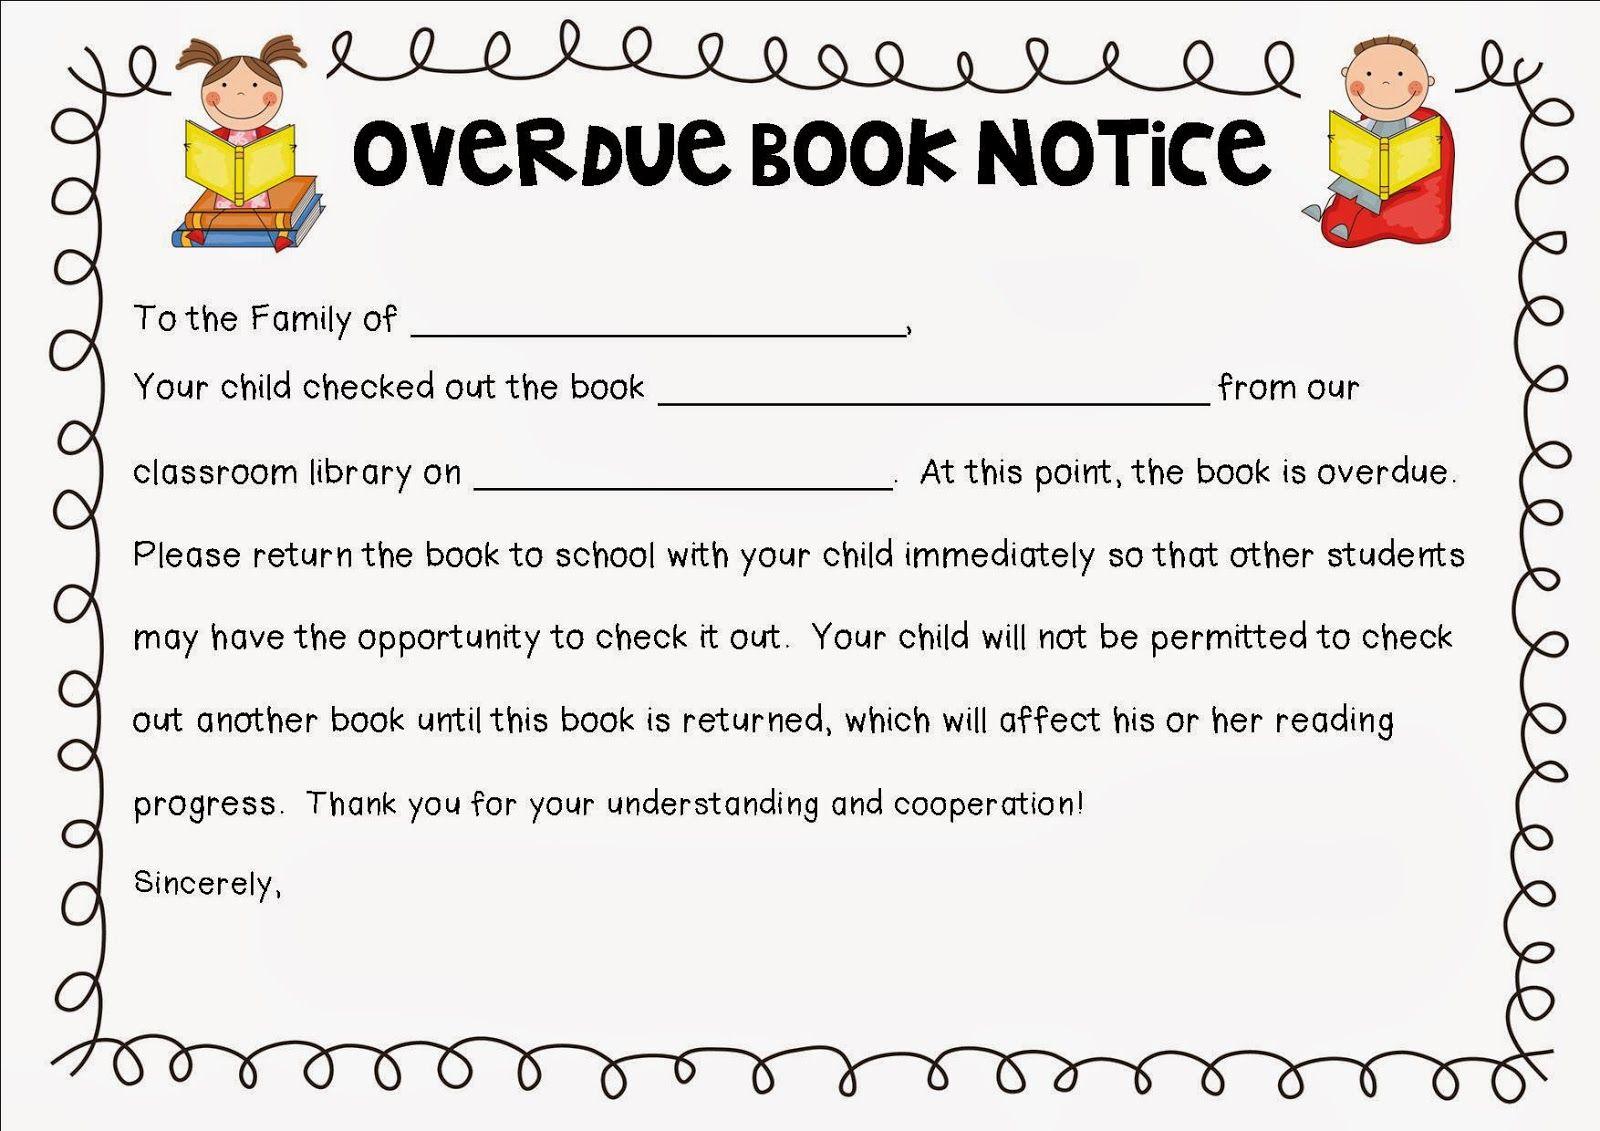 Overdue Book Notice Kindergarten Google Search School Library Books Preschool Library Elementary School Library [ 1131 x 1600 Pixel ]